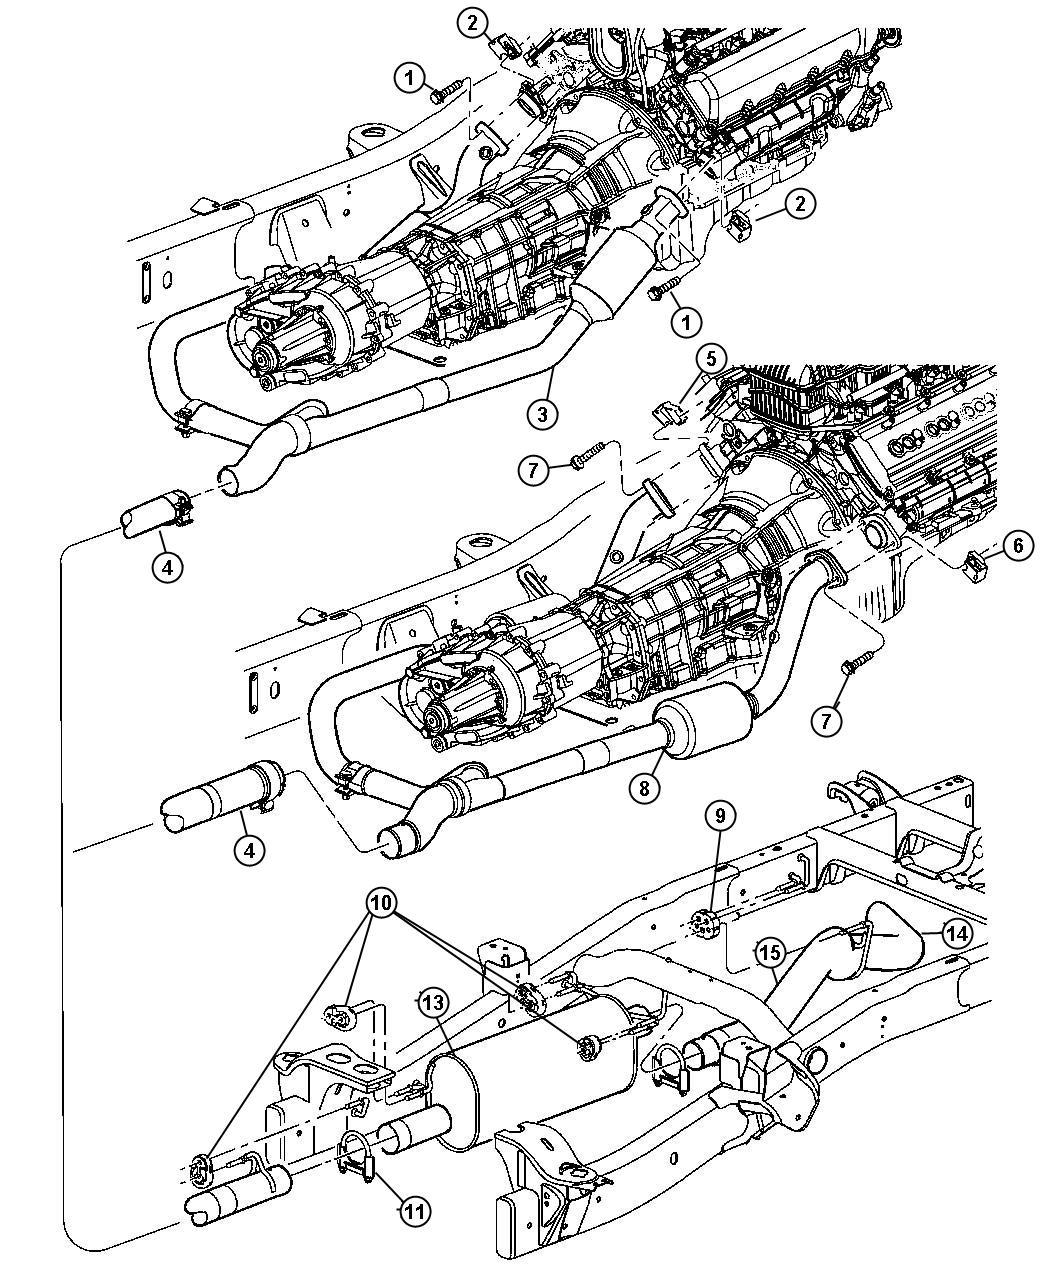 2007 Dodge Ram 1500 Tailpipe. Exhaust. Ekg, system